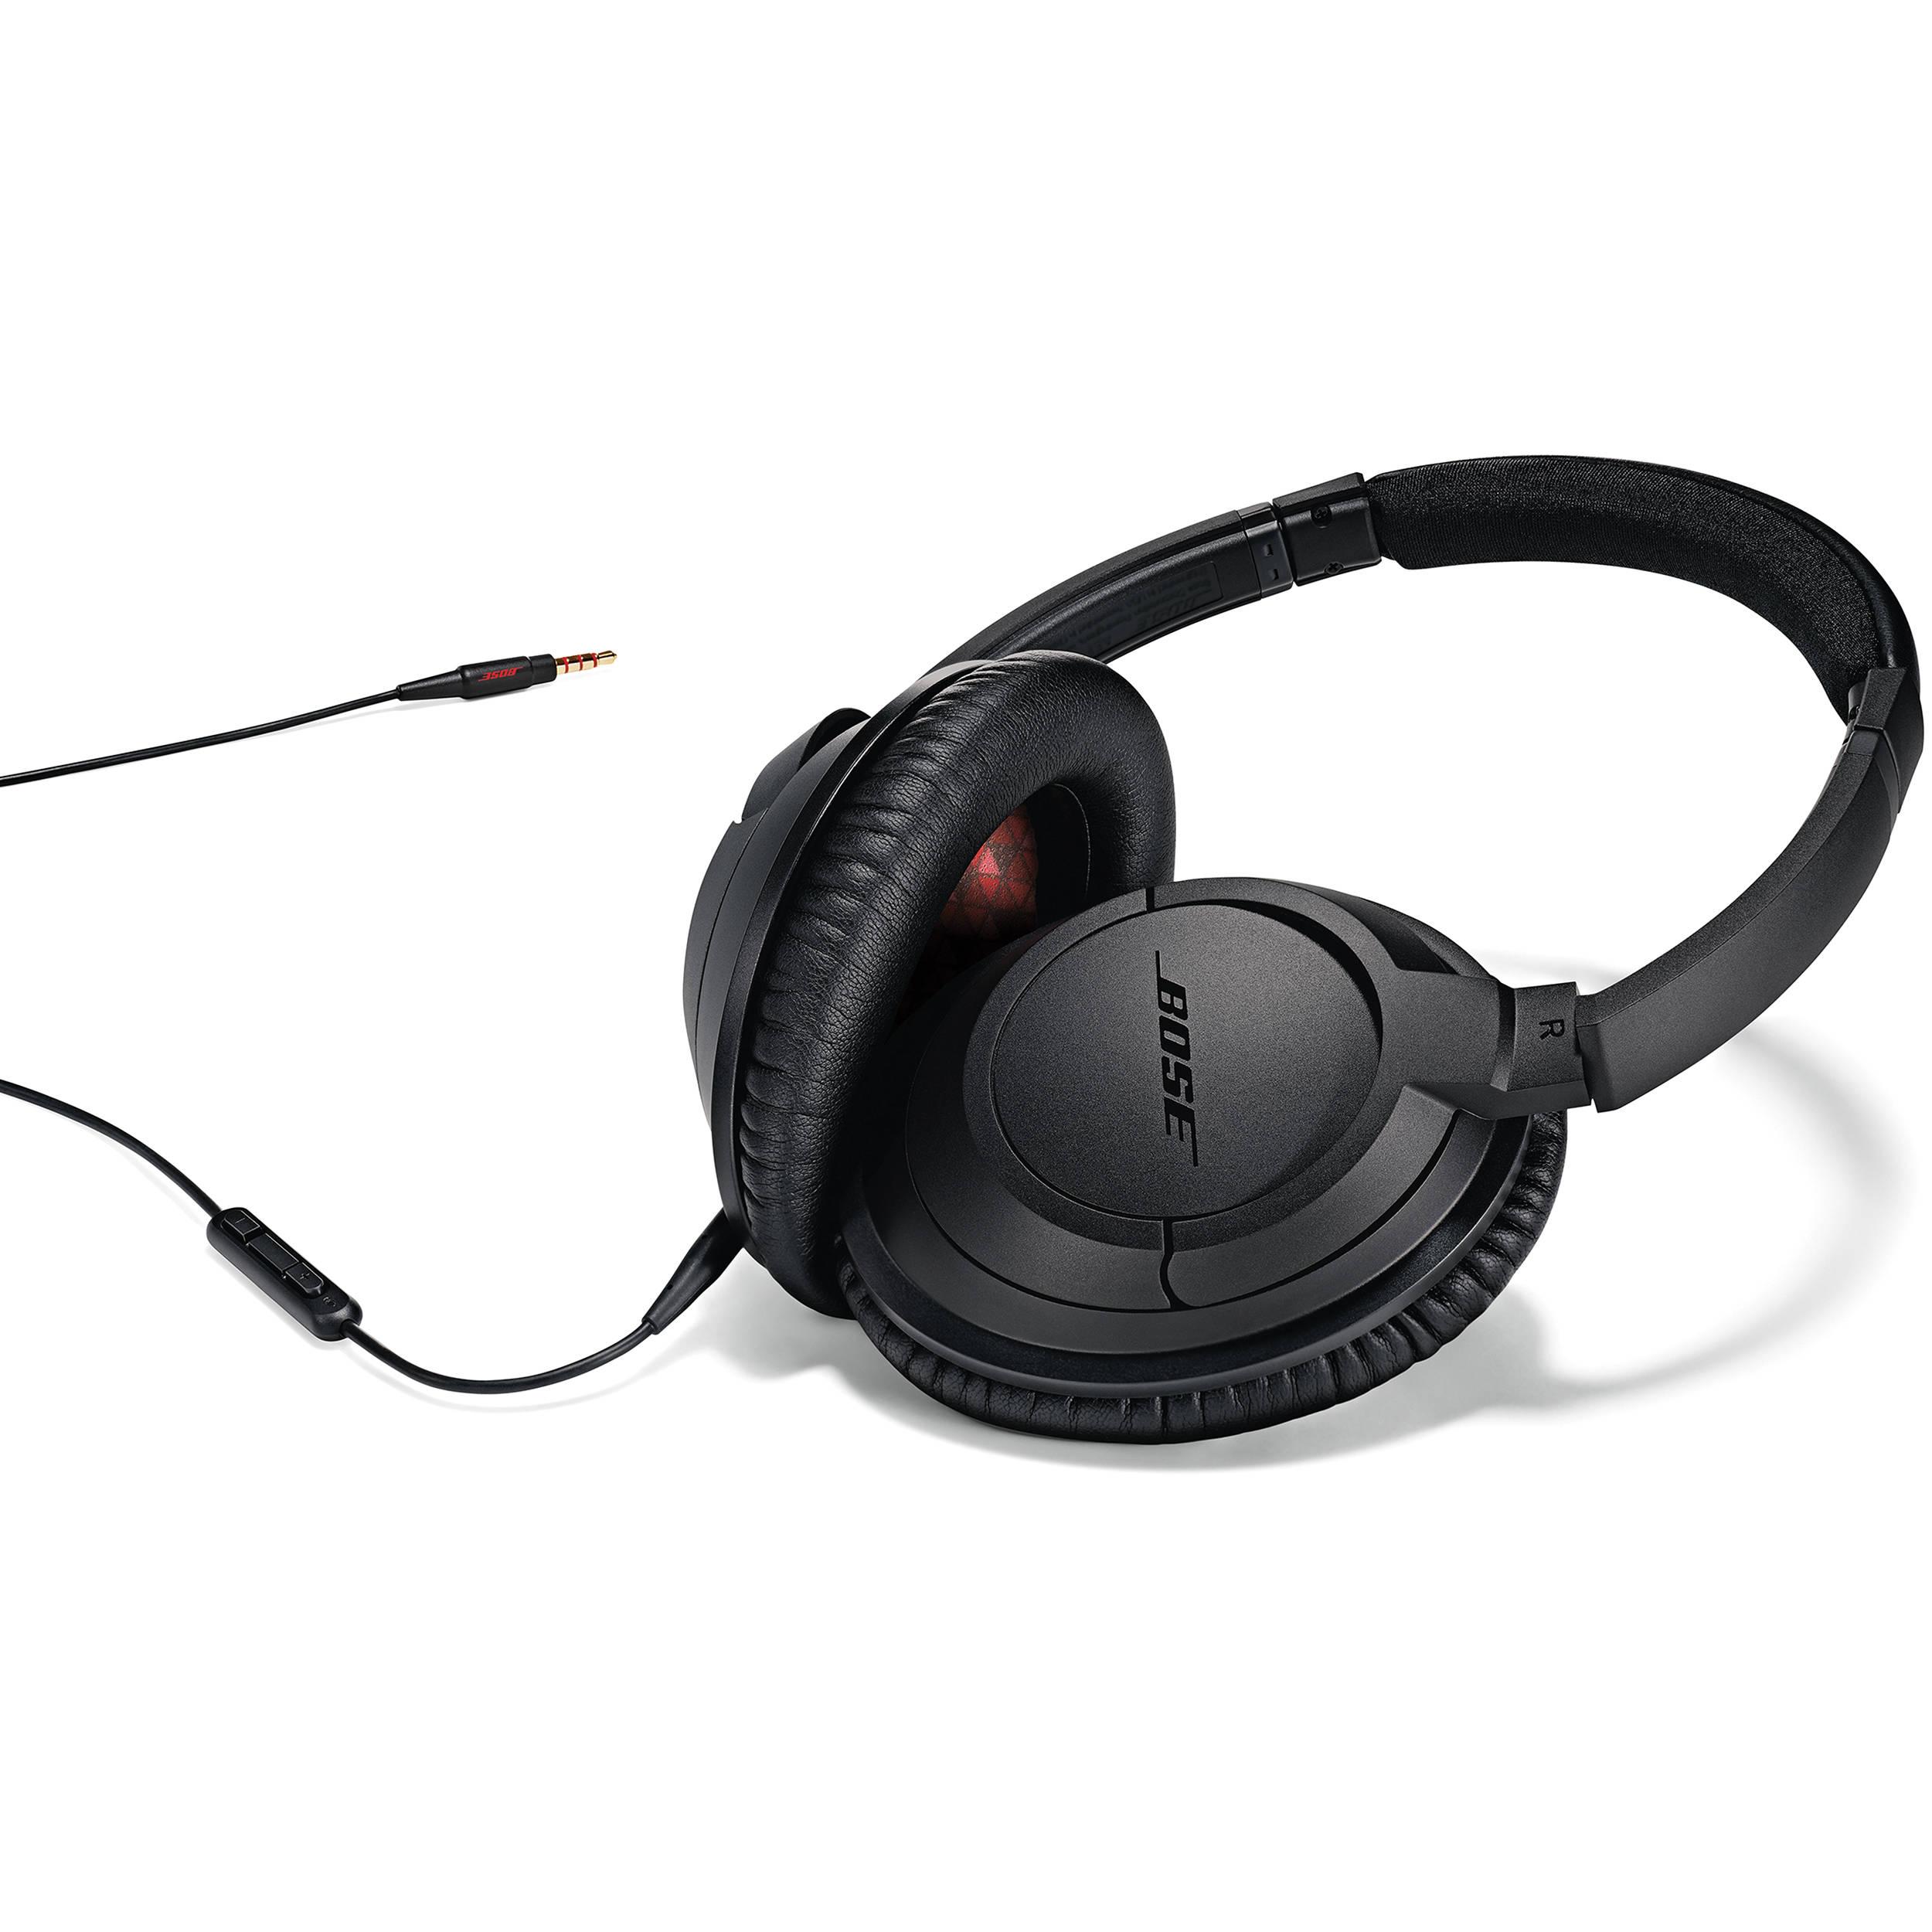 40faa61865c Bose SoundTrue Around-Ear Headphones (Black) 626238-0010 B&H